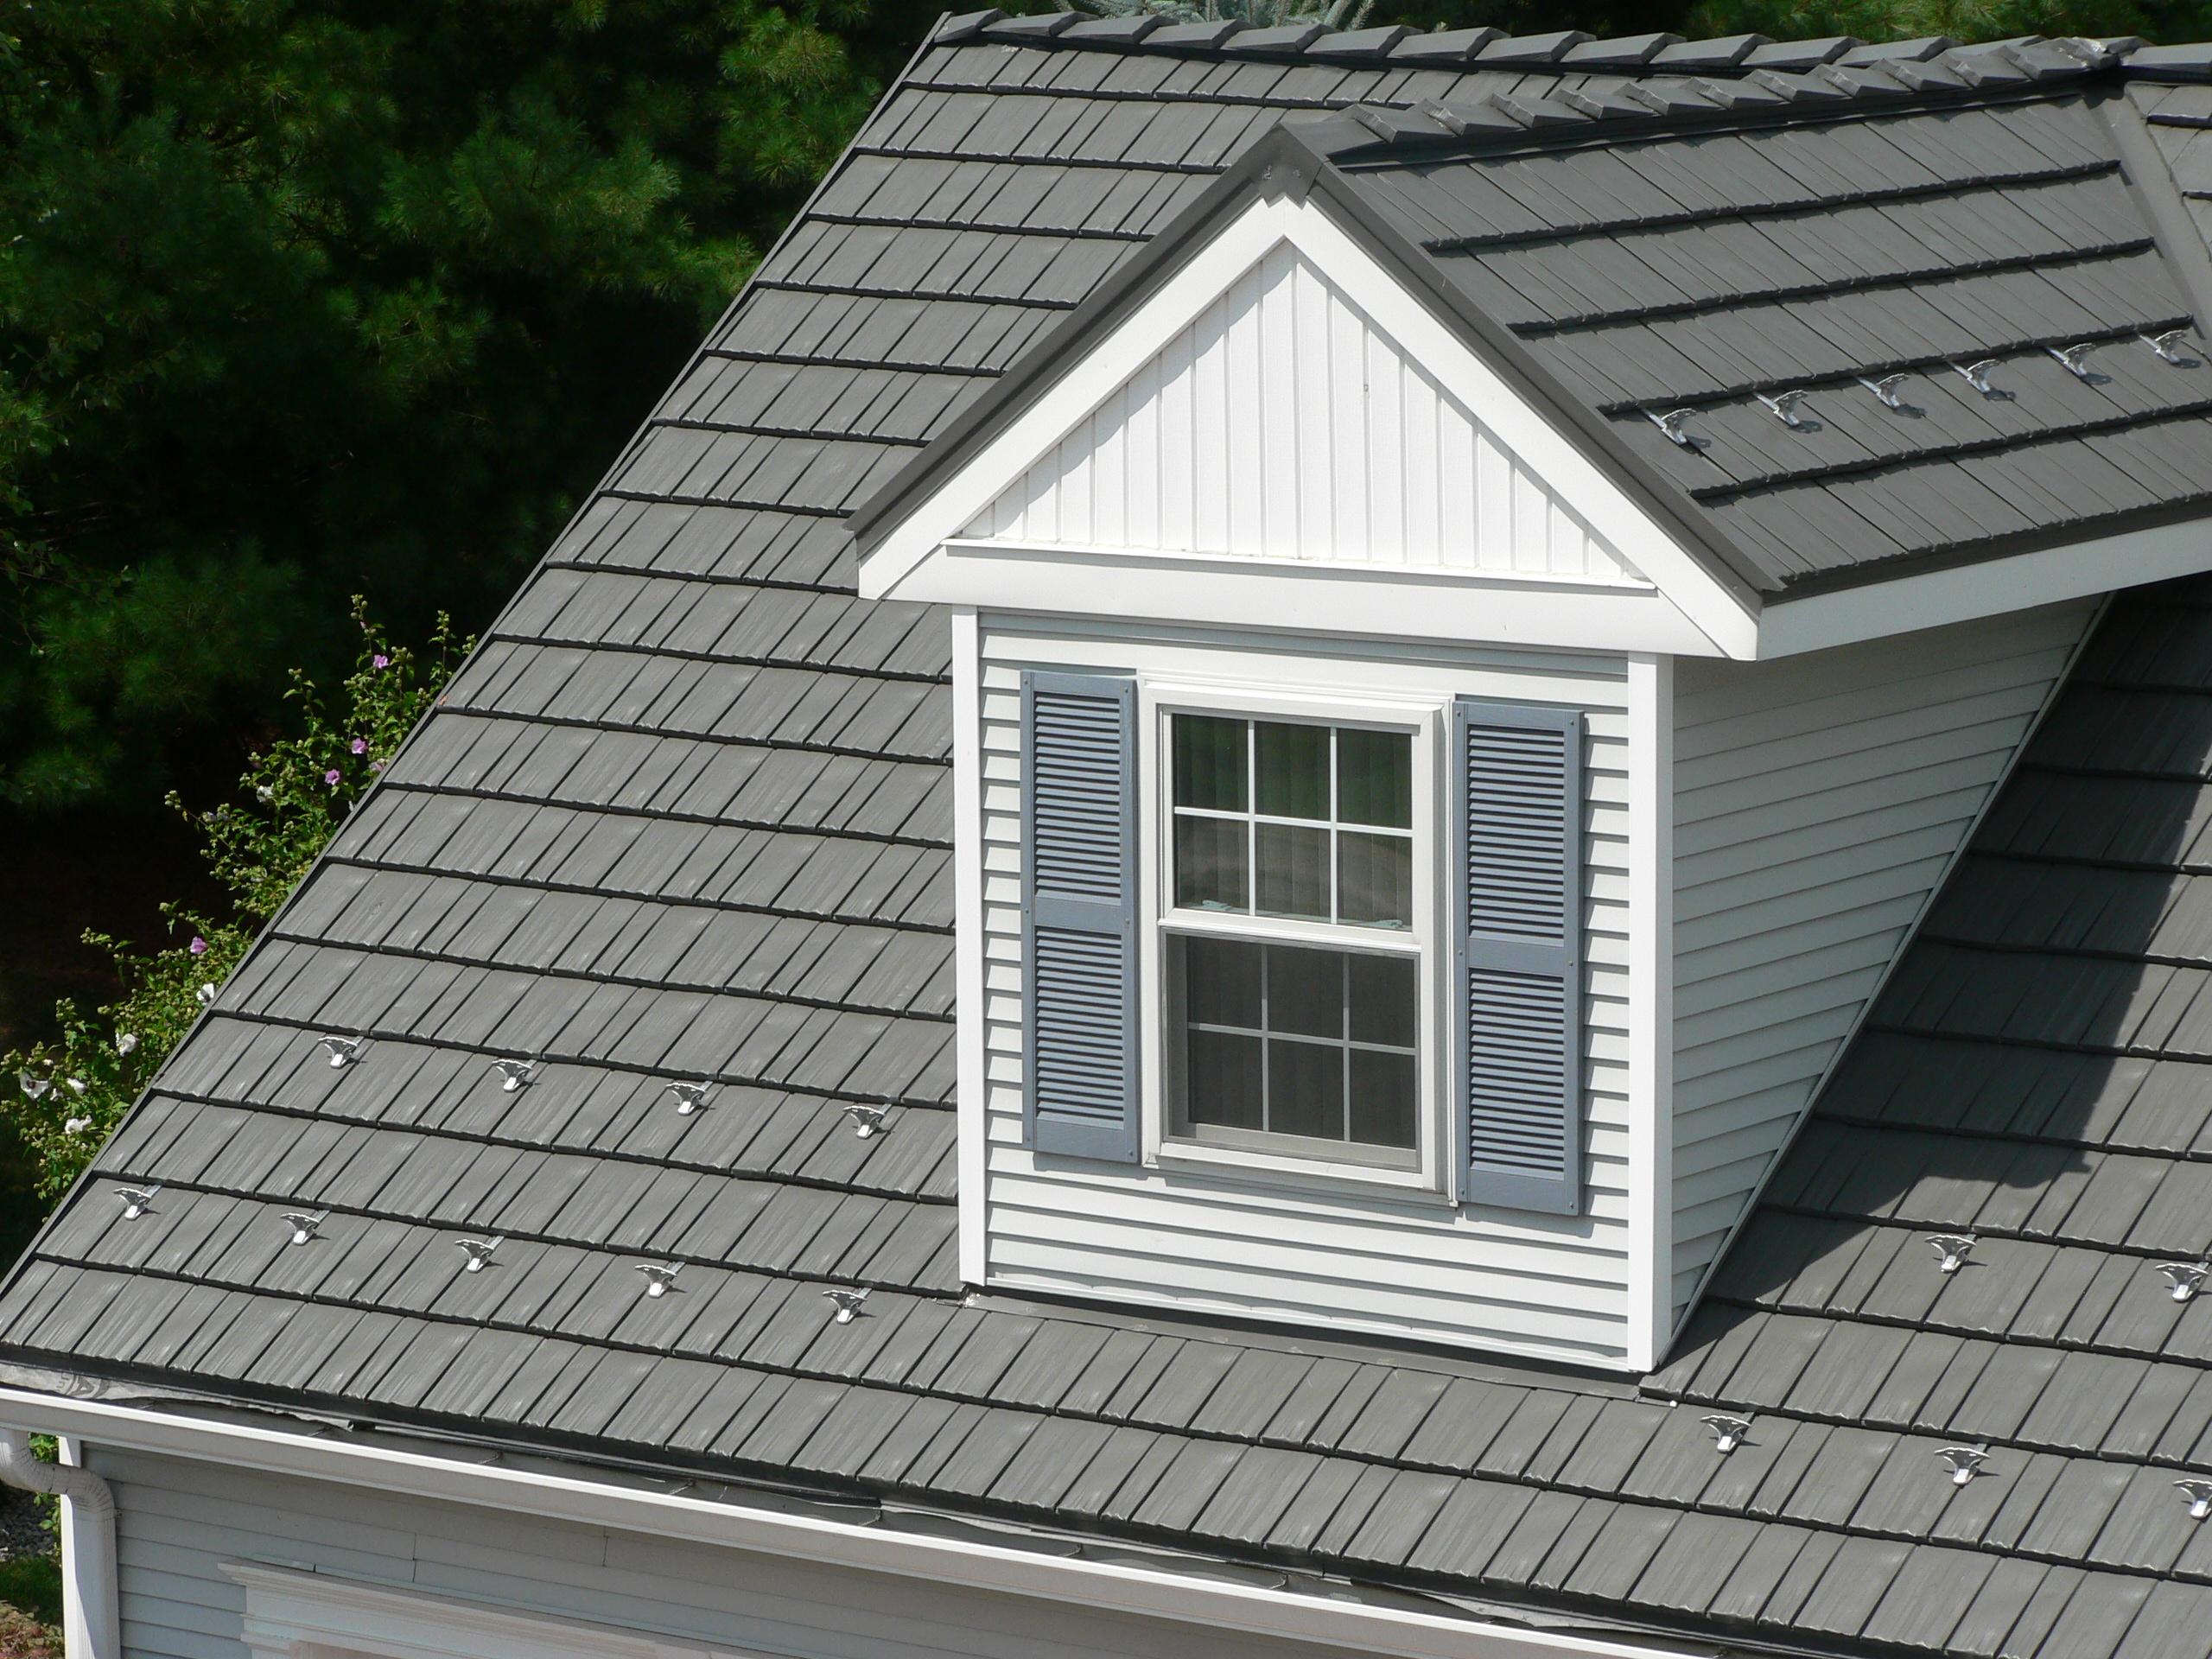 Classic Metal Roofs Llc Stow Ma 01775 Angies List